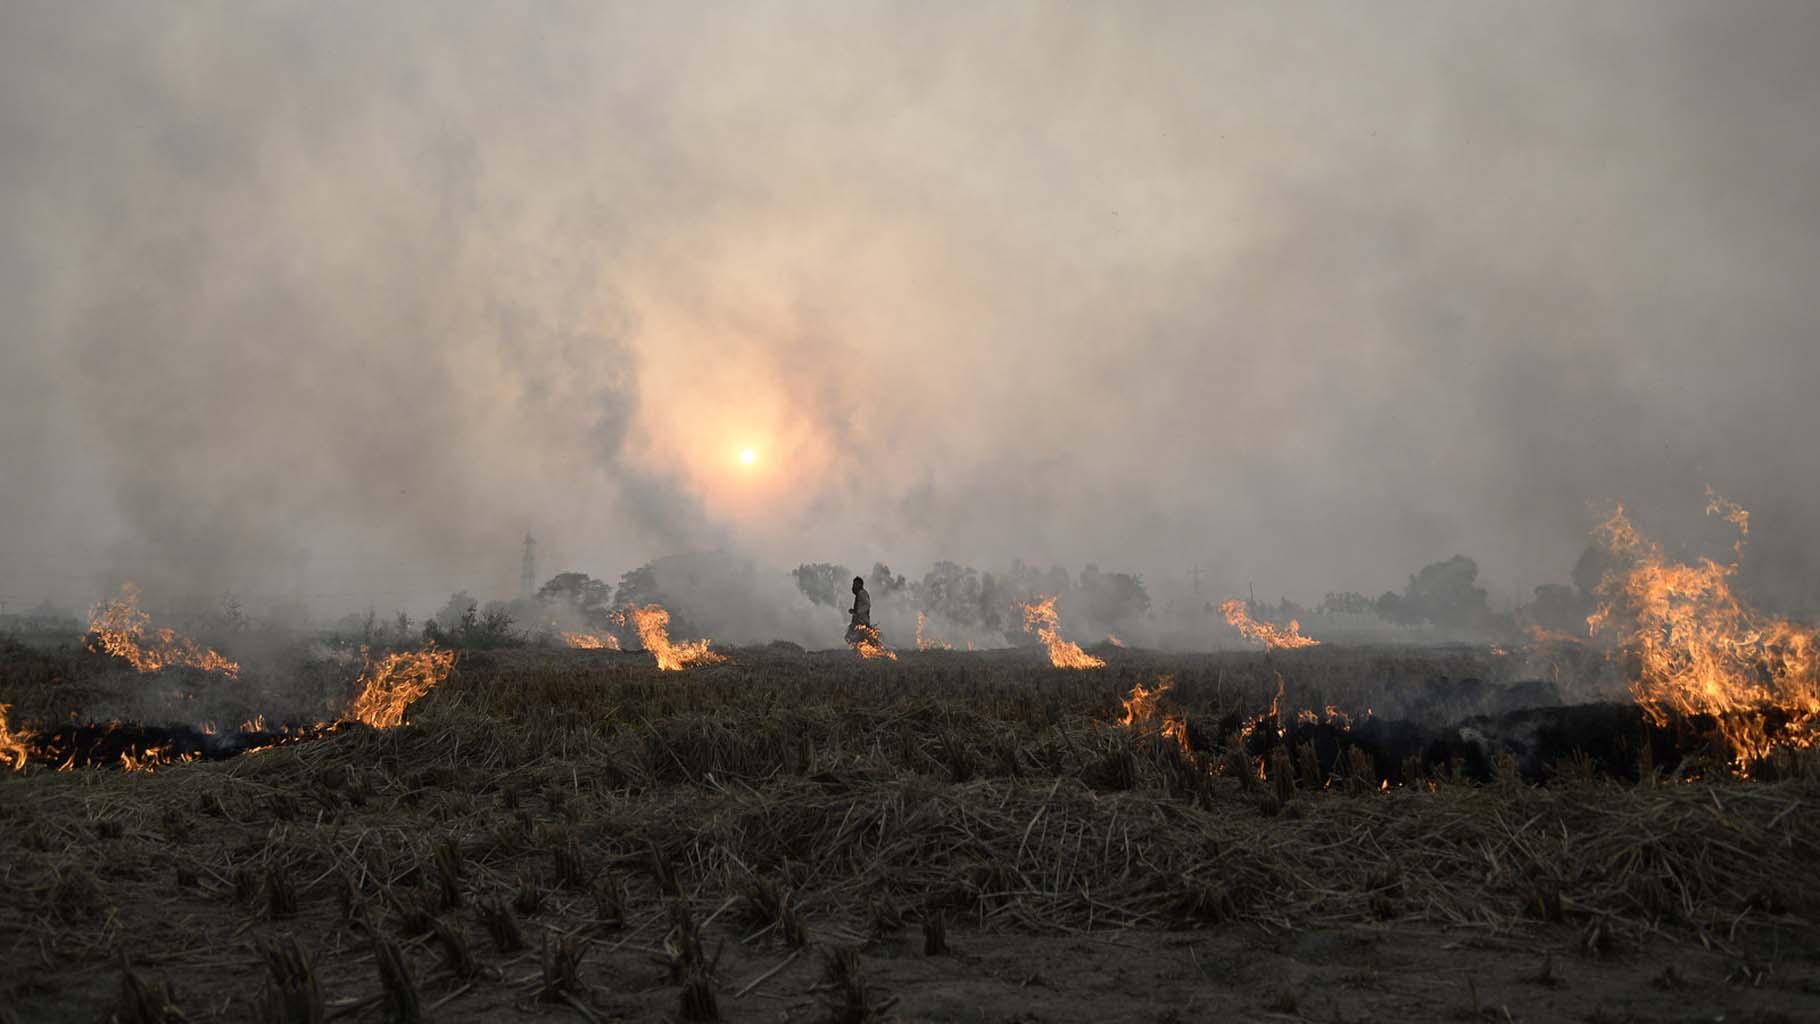 Pollution, Stubble burning, Paddy burning, Farm fires